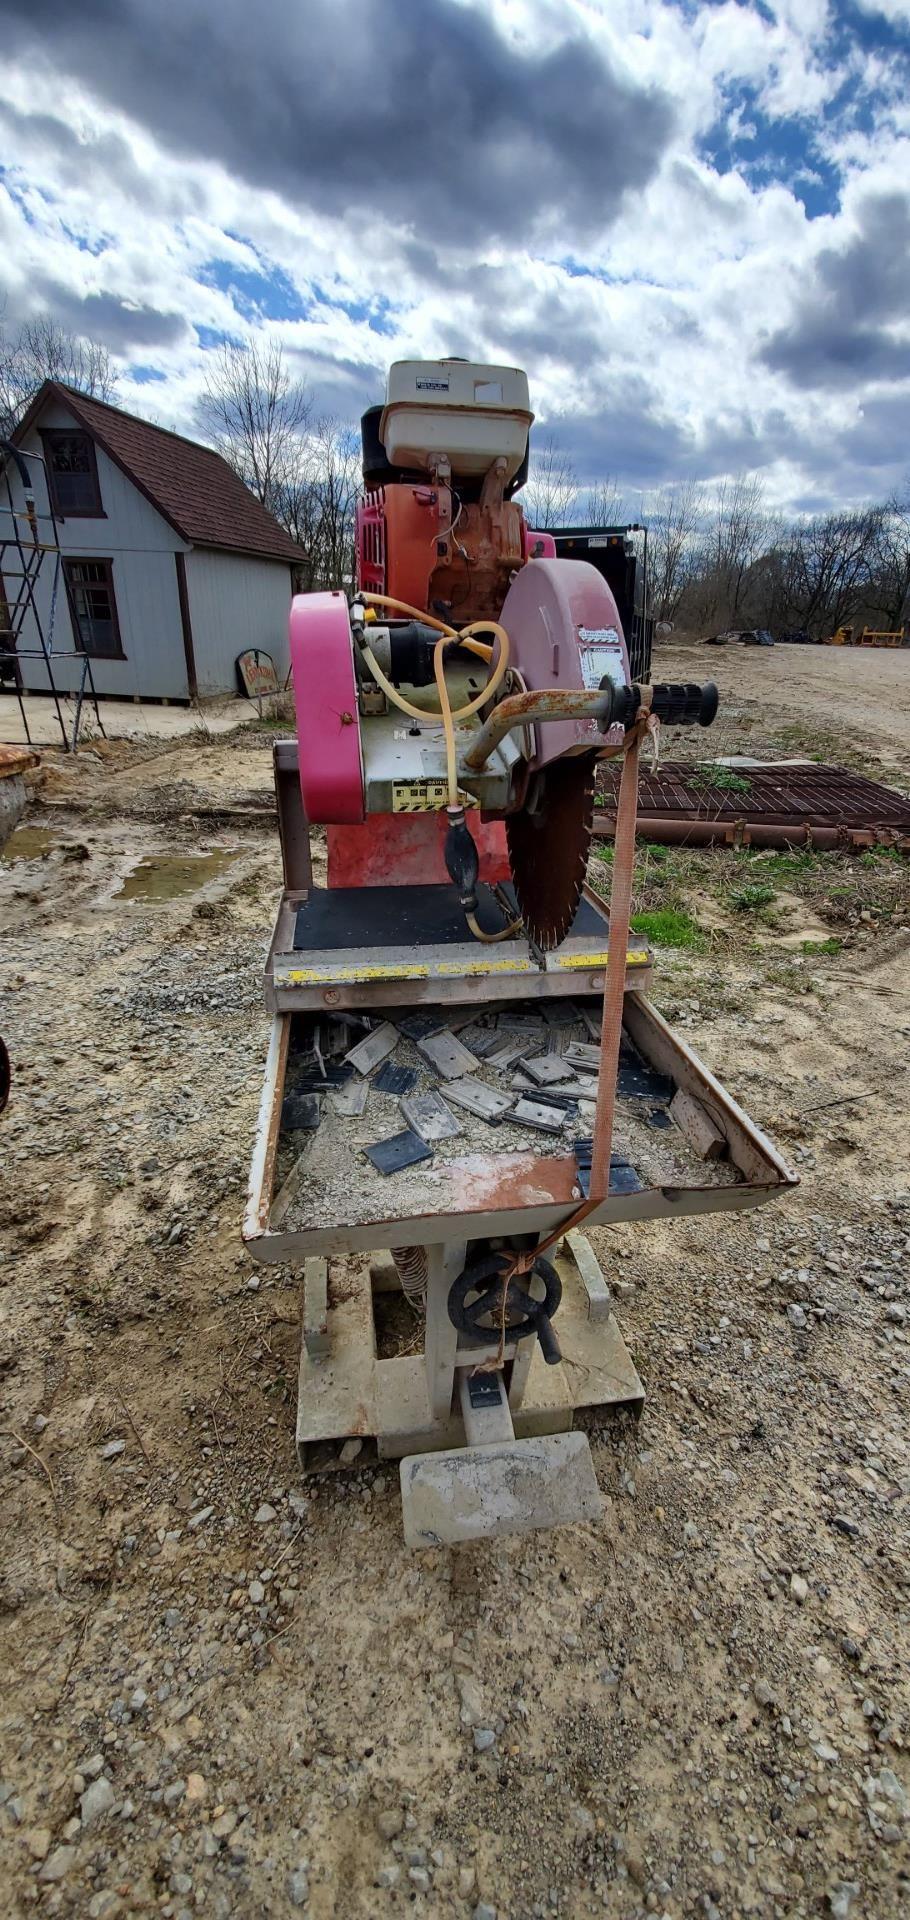 Stone Model MS2 20 in Masonry Block Saw, 13 HP Honda Gas Engine - Image 3 of 8